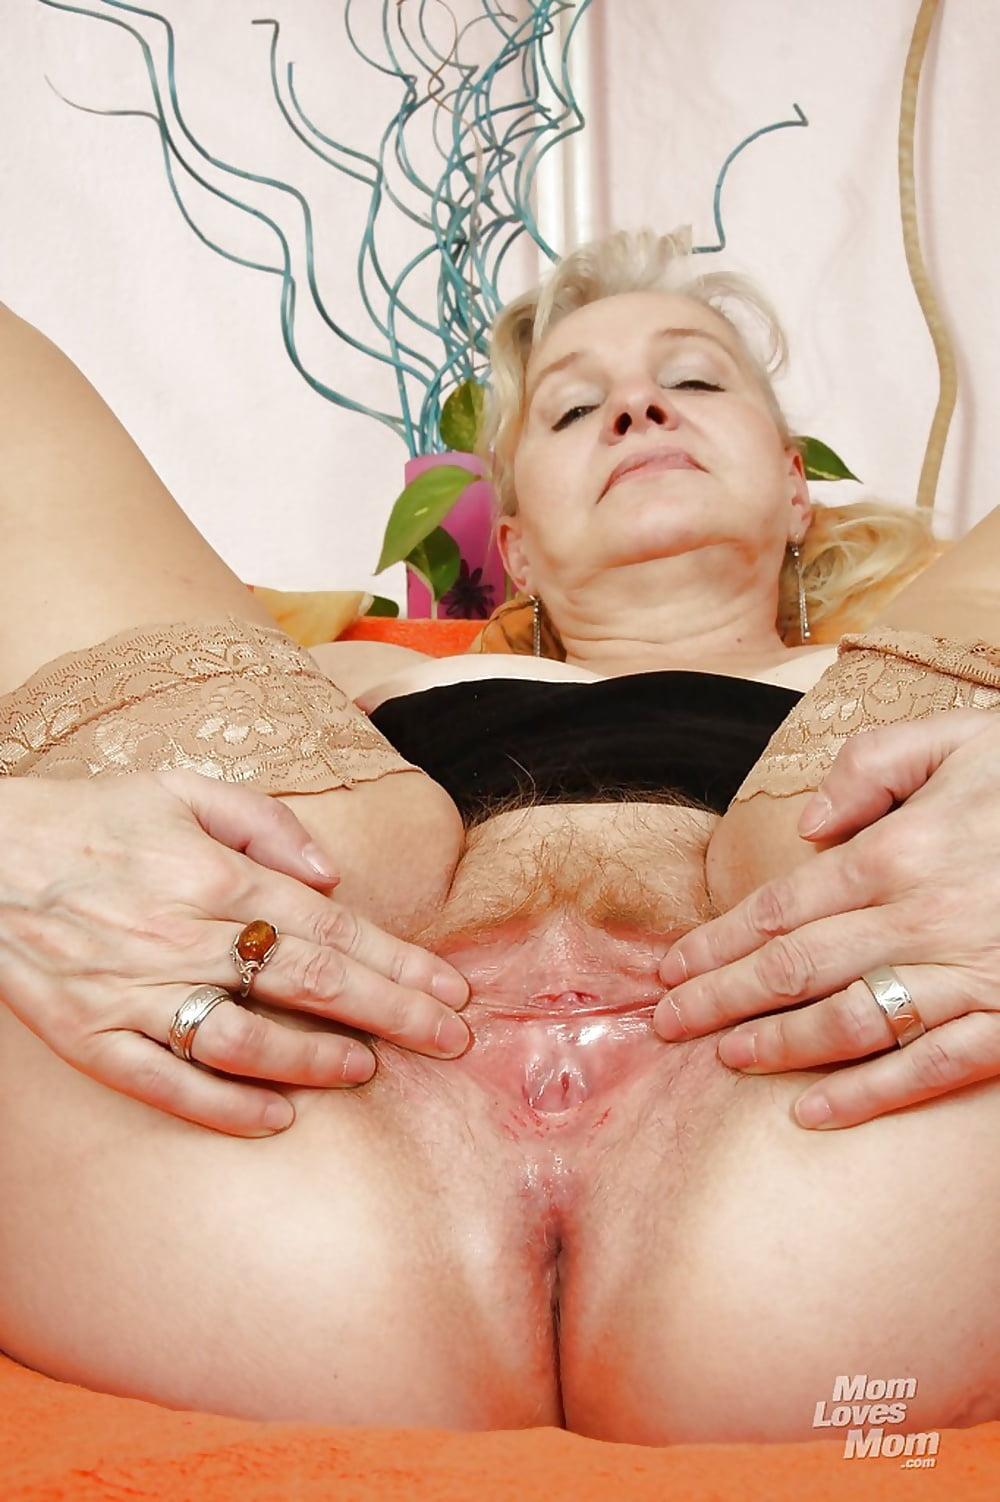 Мастурбирующие старушки порно, горячее мамино порно фото